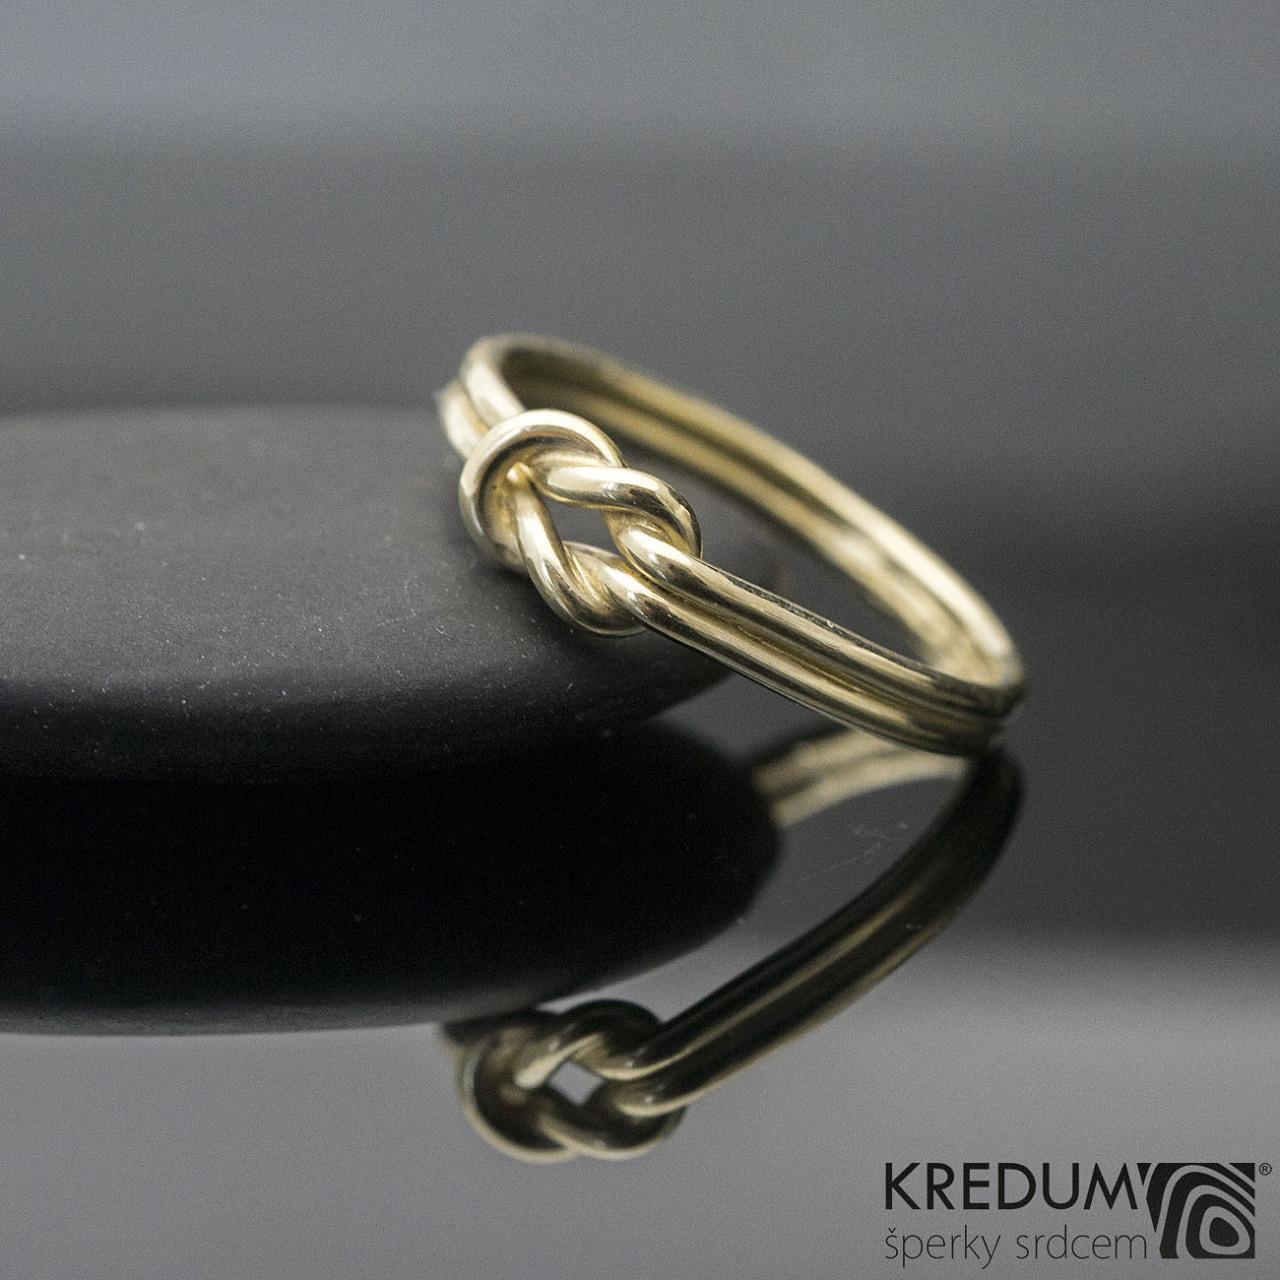 Marge Yellow Zlaty Snubni Prsten Sk1293 Vyroba Hand Made Snubni